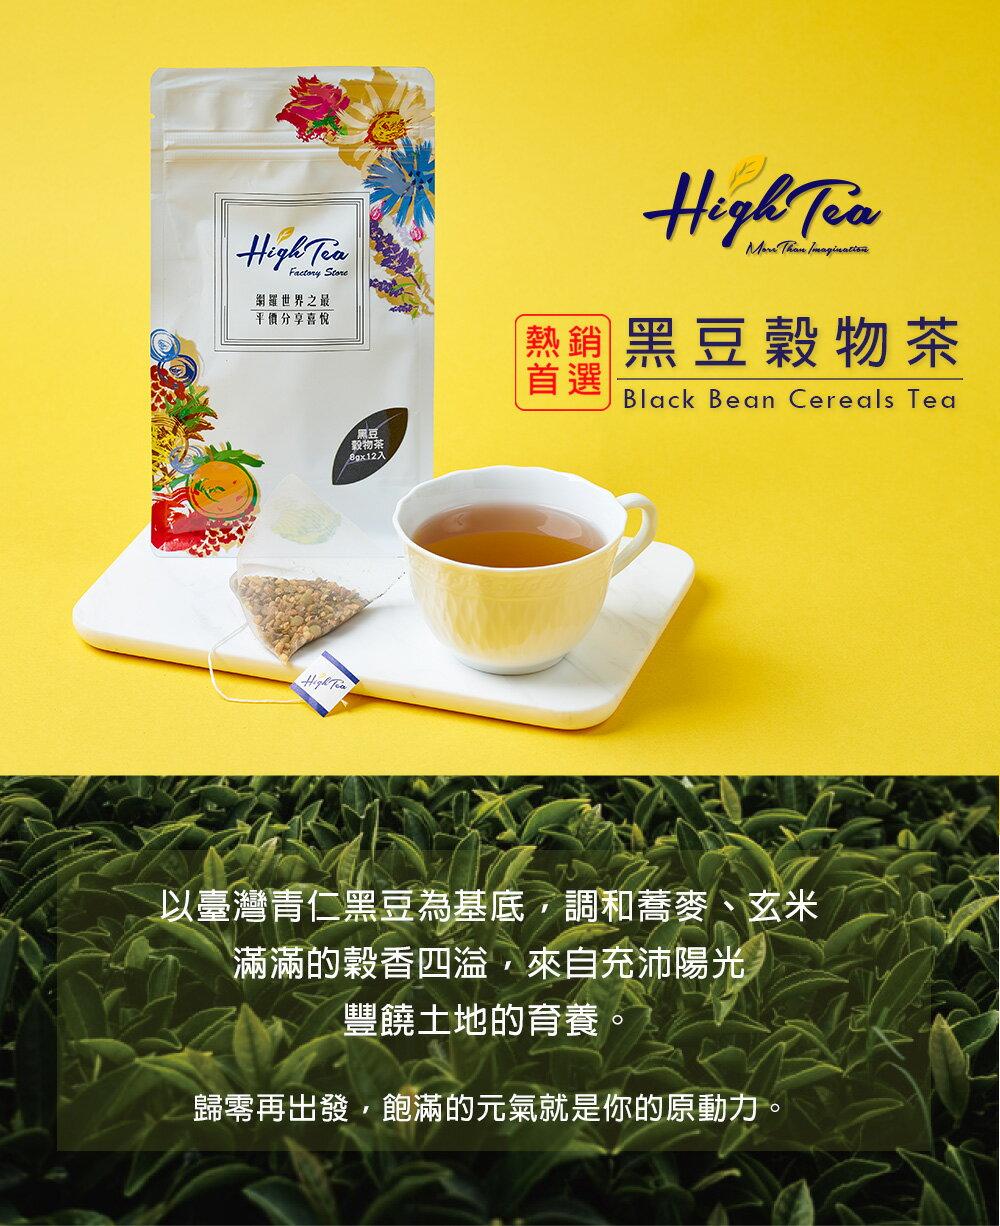 High Tea 台南3號青仁黑豆 黑豆穀物茶 8g x 12入 台灣在地元素